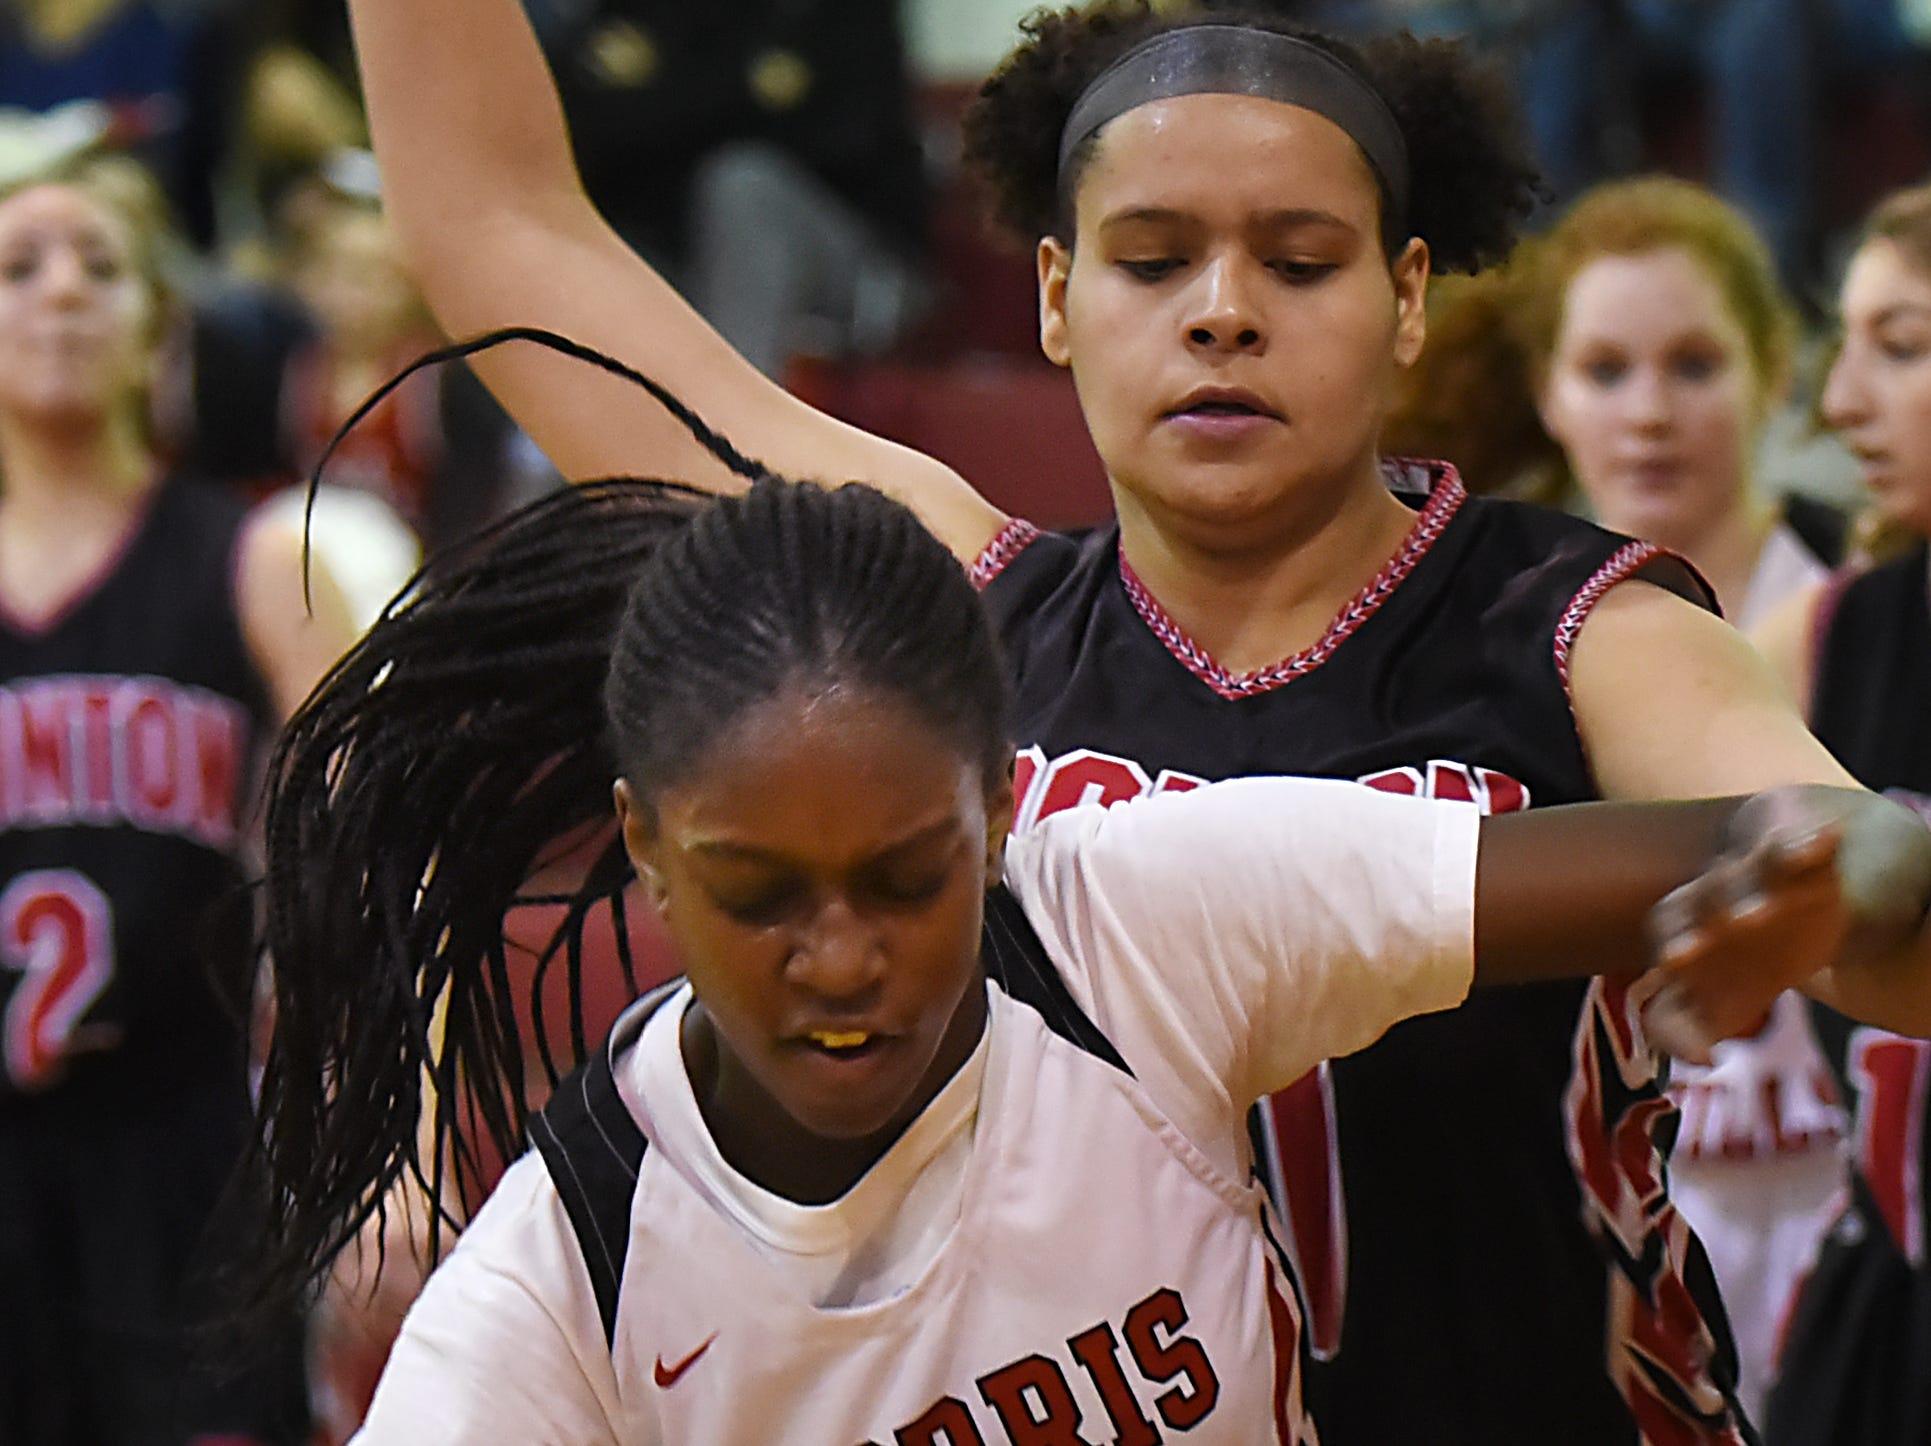 Boonton Vs. Morris Hills girls basketball game at the Morris Hills Holiday Tournament in Rockaway on Friday December 28, 2018. MH#24 Semaya Turner and B#31 Bianca Morc.